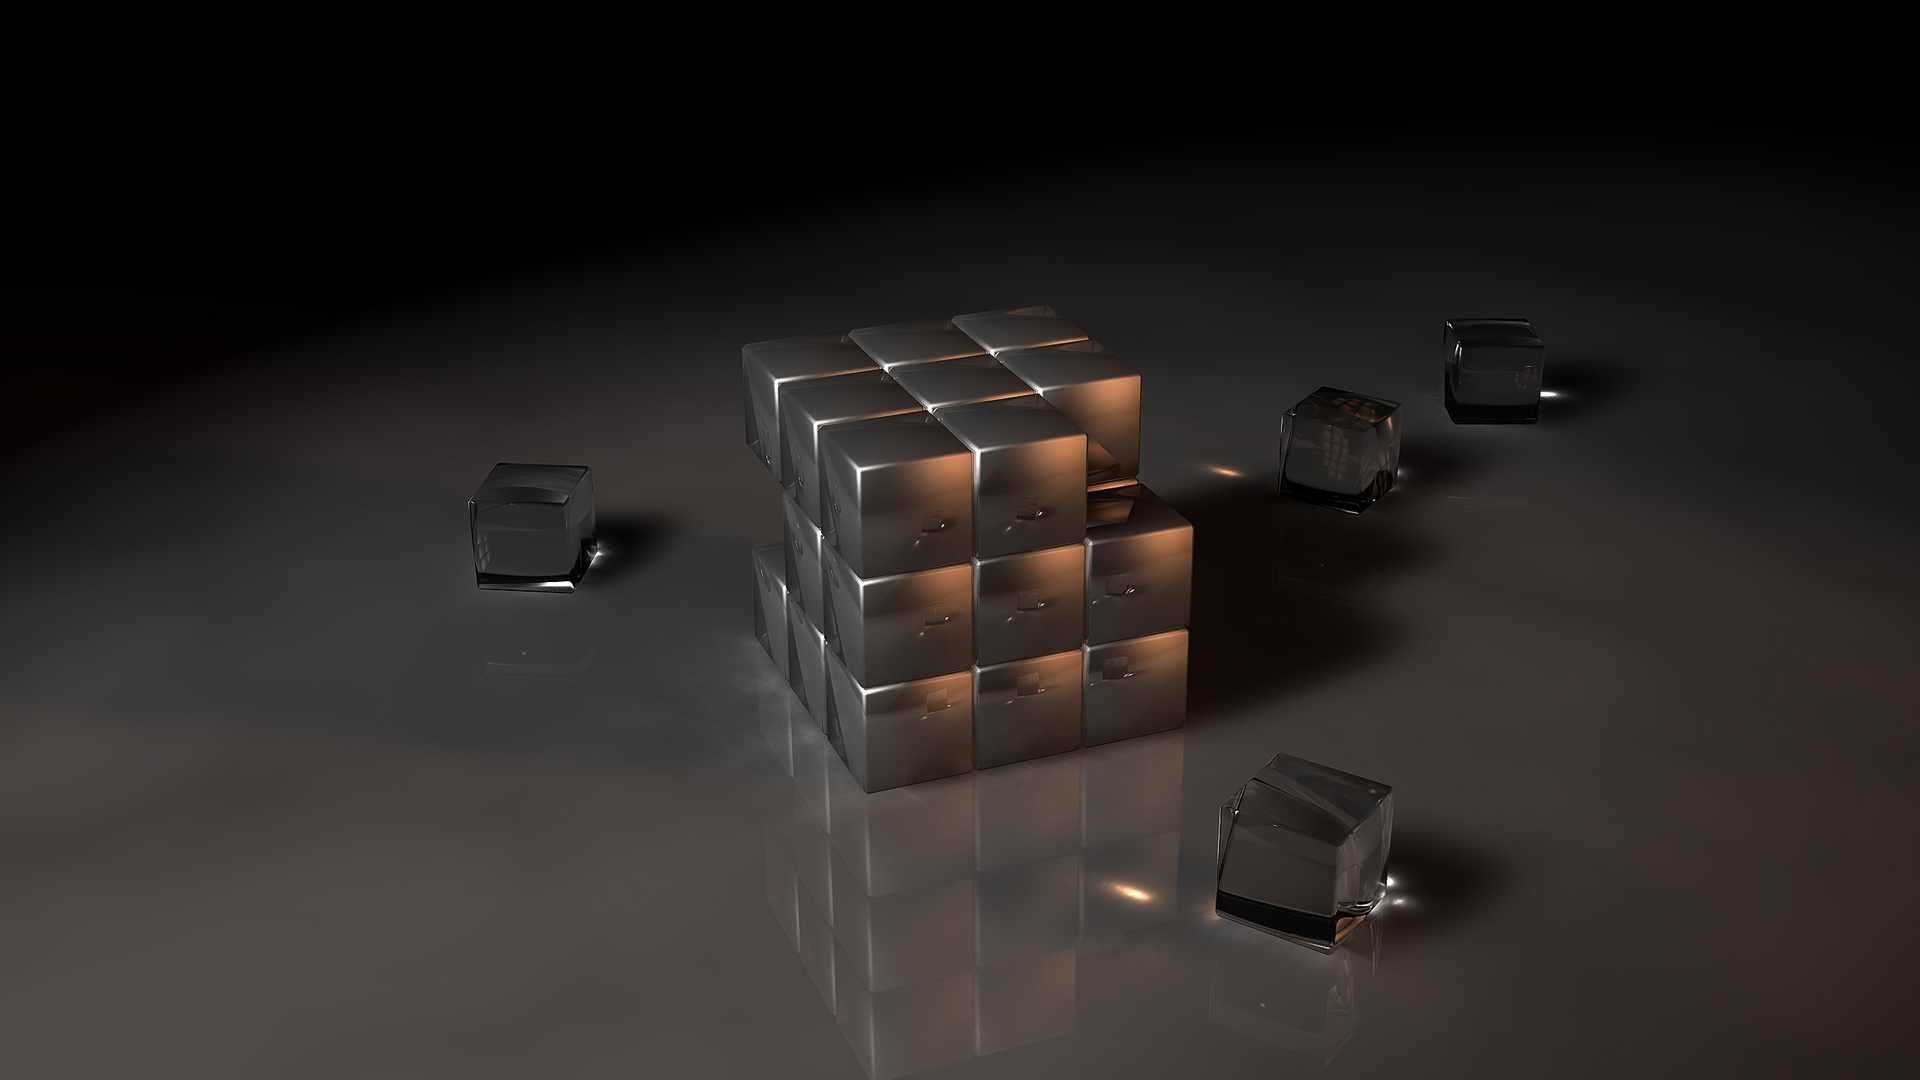 1920 x 1080 Wallpapers Full HD Wallpapers 1080p 17773 3d 3d cubes 1920x1080